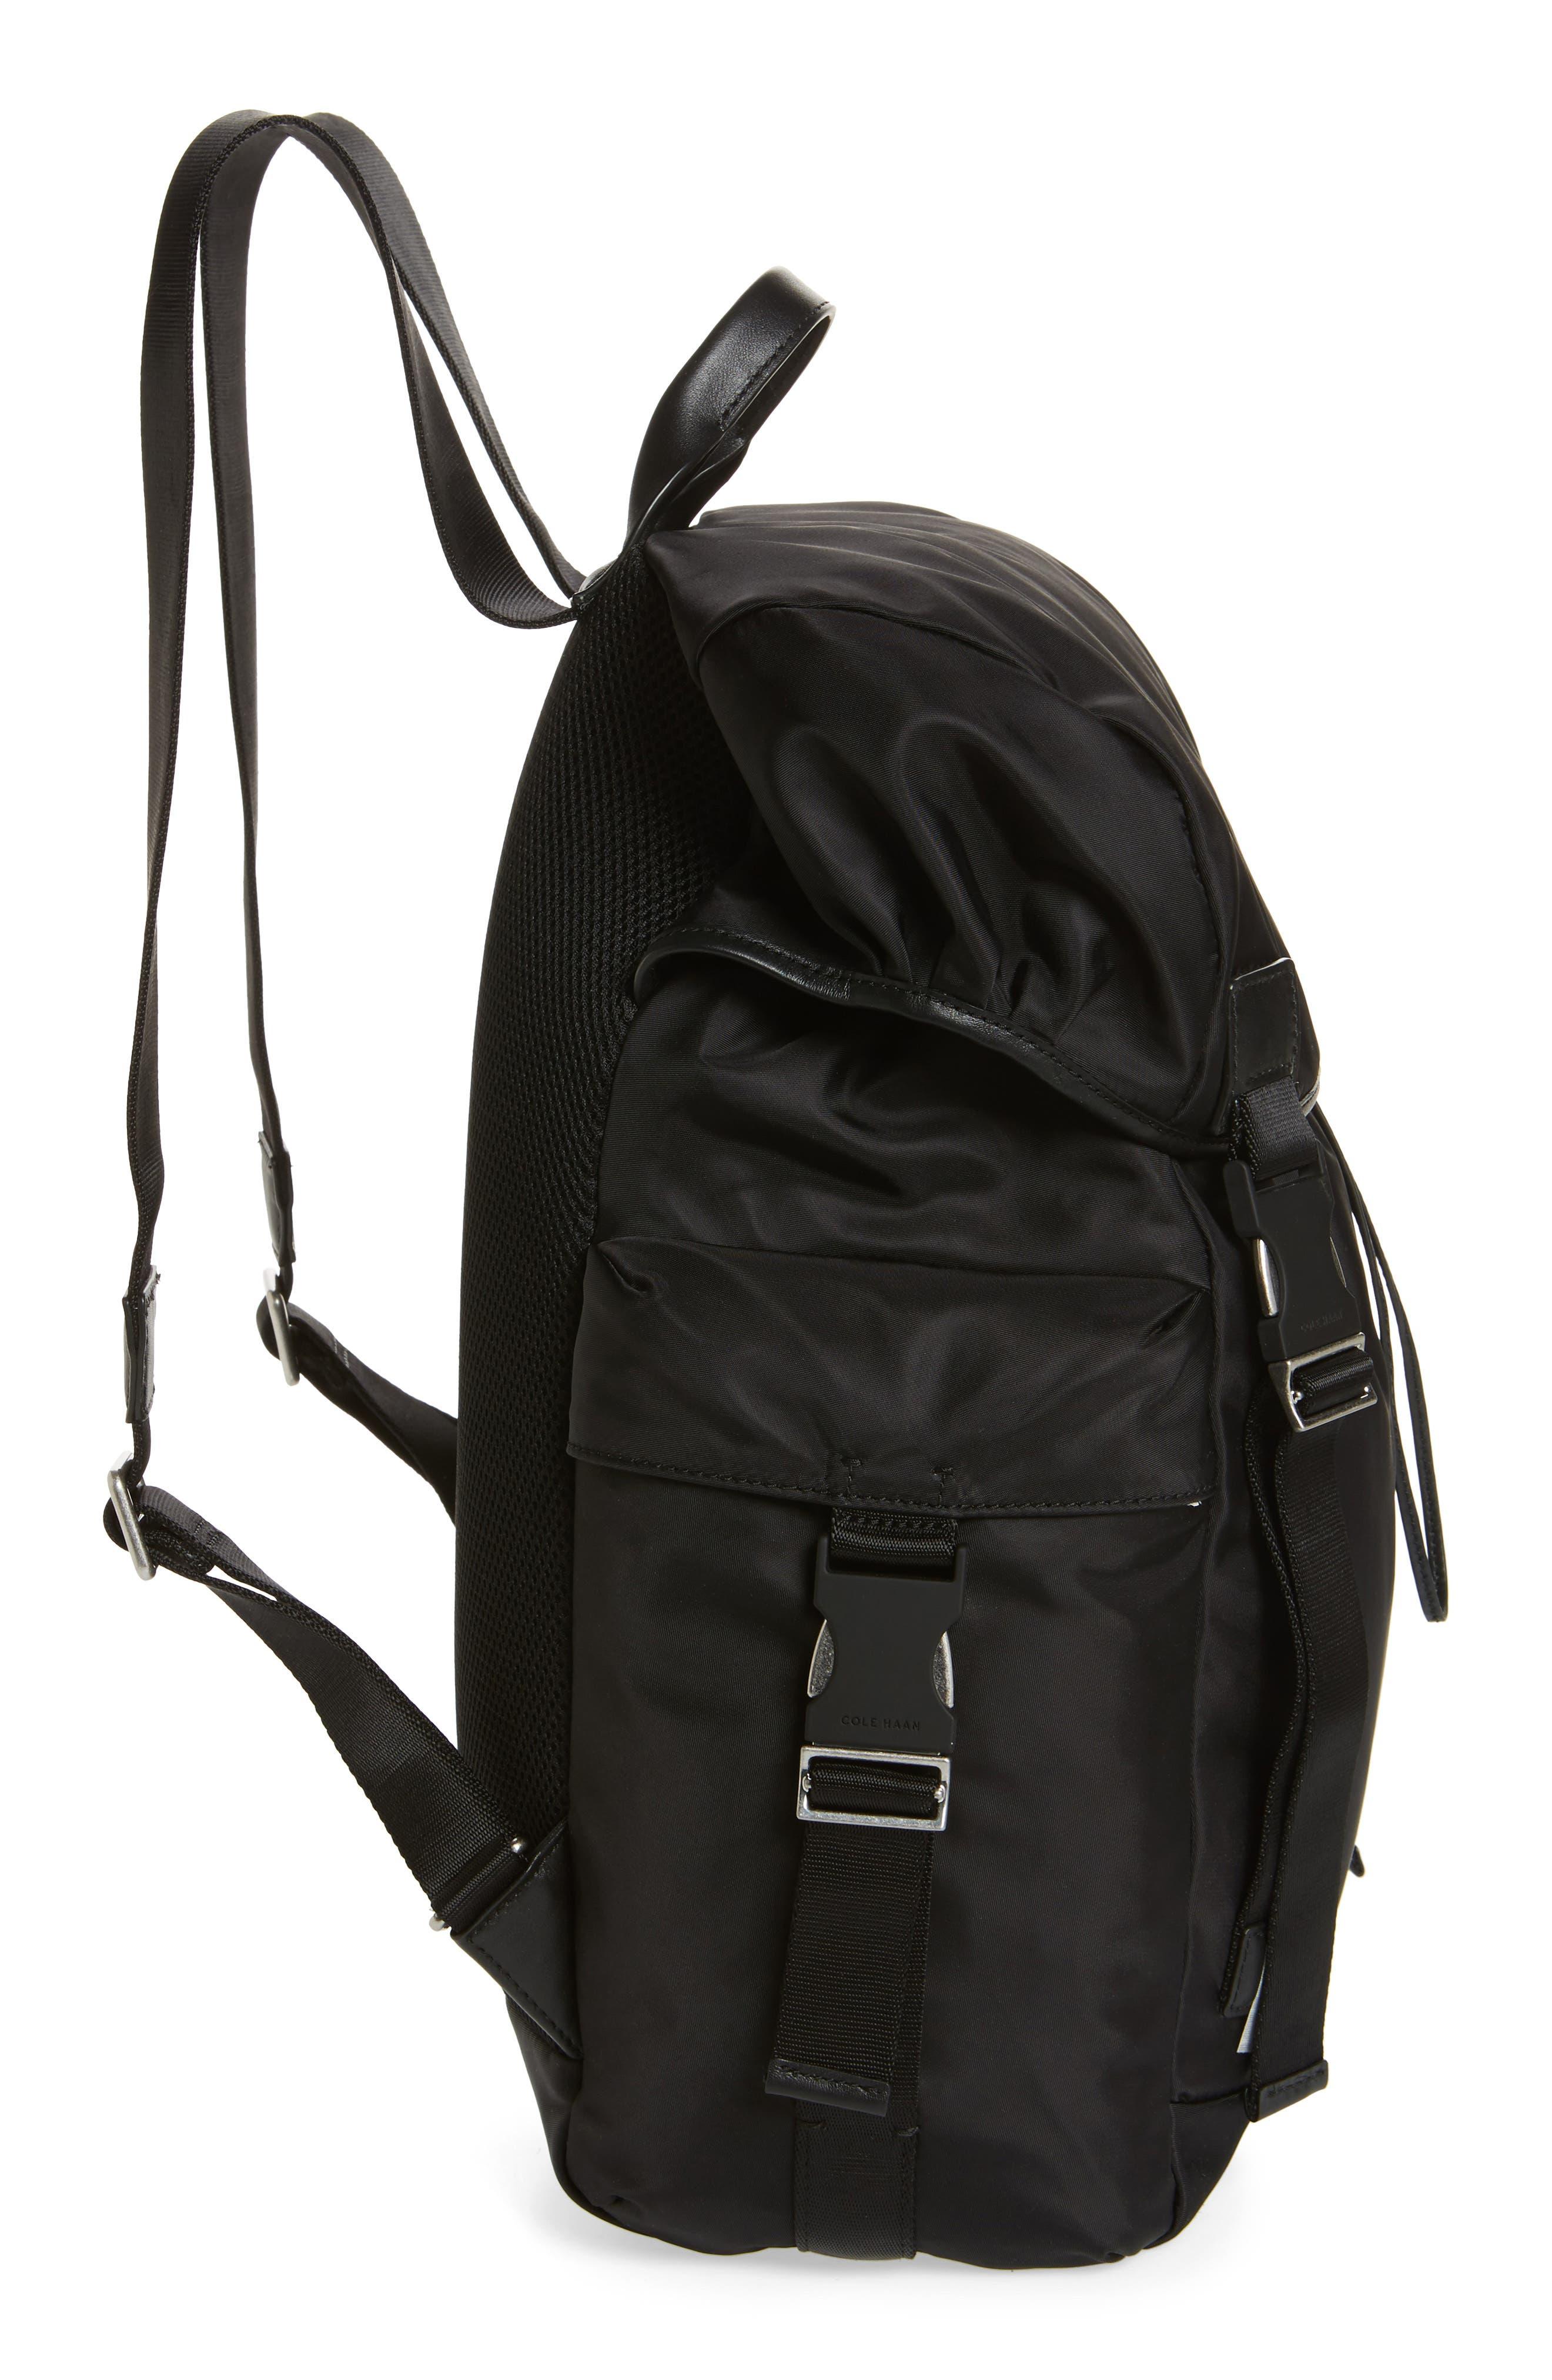 City Backpack,                             Alternate thumbnail 5, color,                             Black